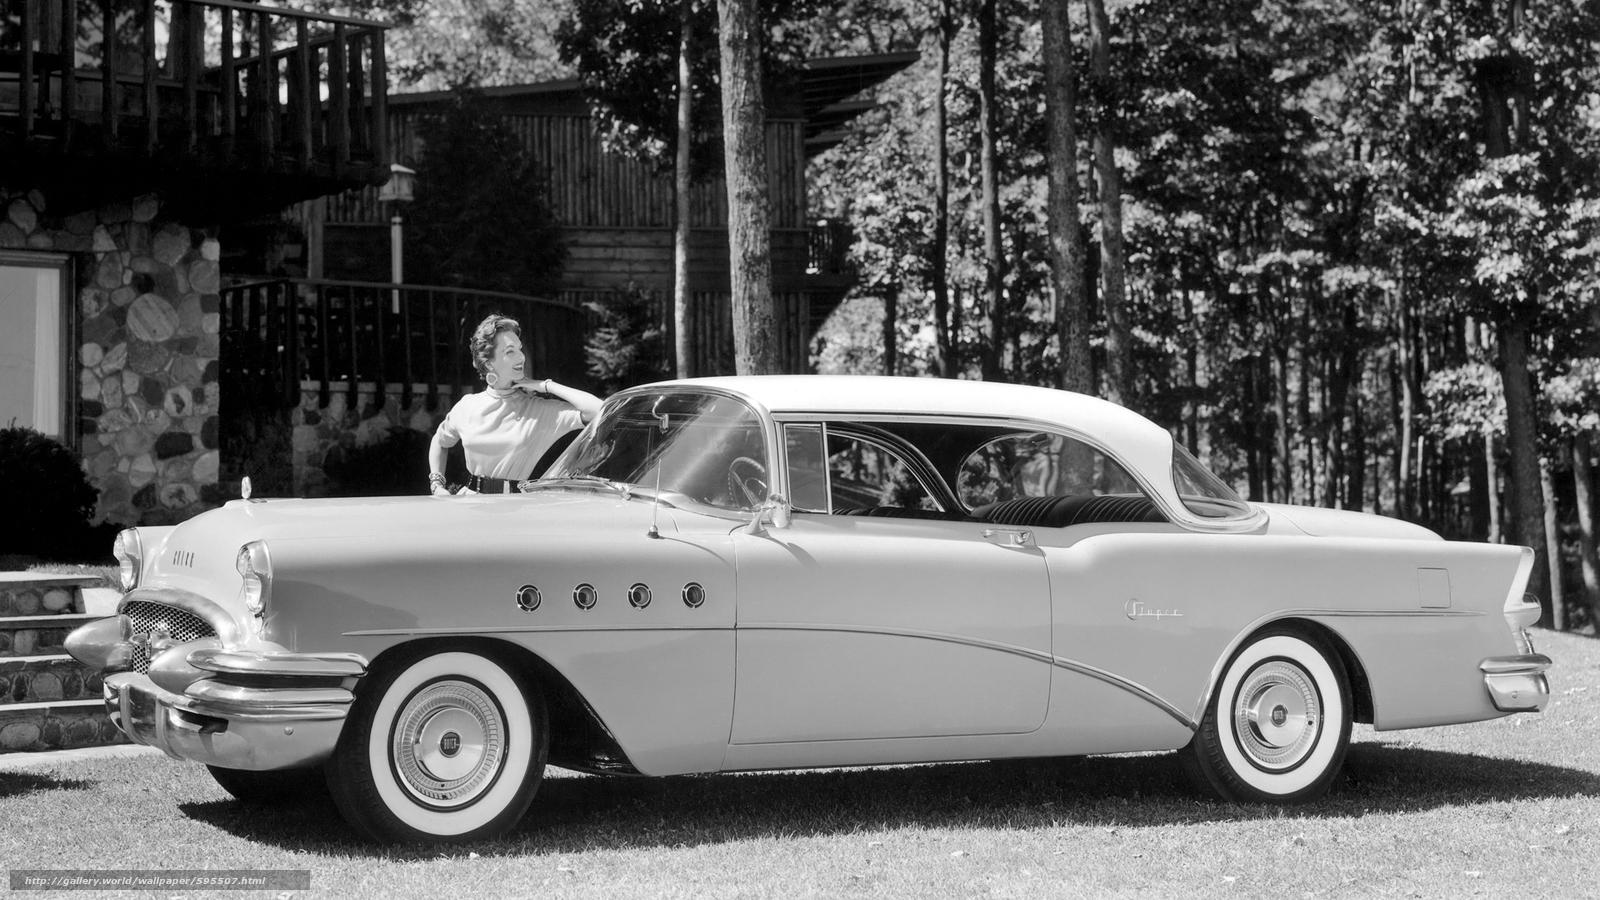 tlcharger fond d 39 ecran classique voiture nostalgie 1955 buick super riviera hardtop coupe. Black Bedroom Furniture Sets. Home Design Ideas